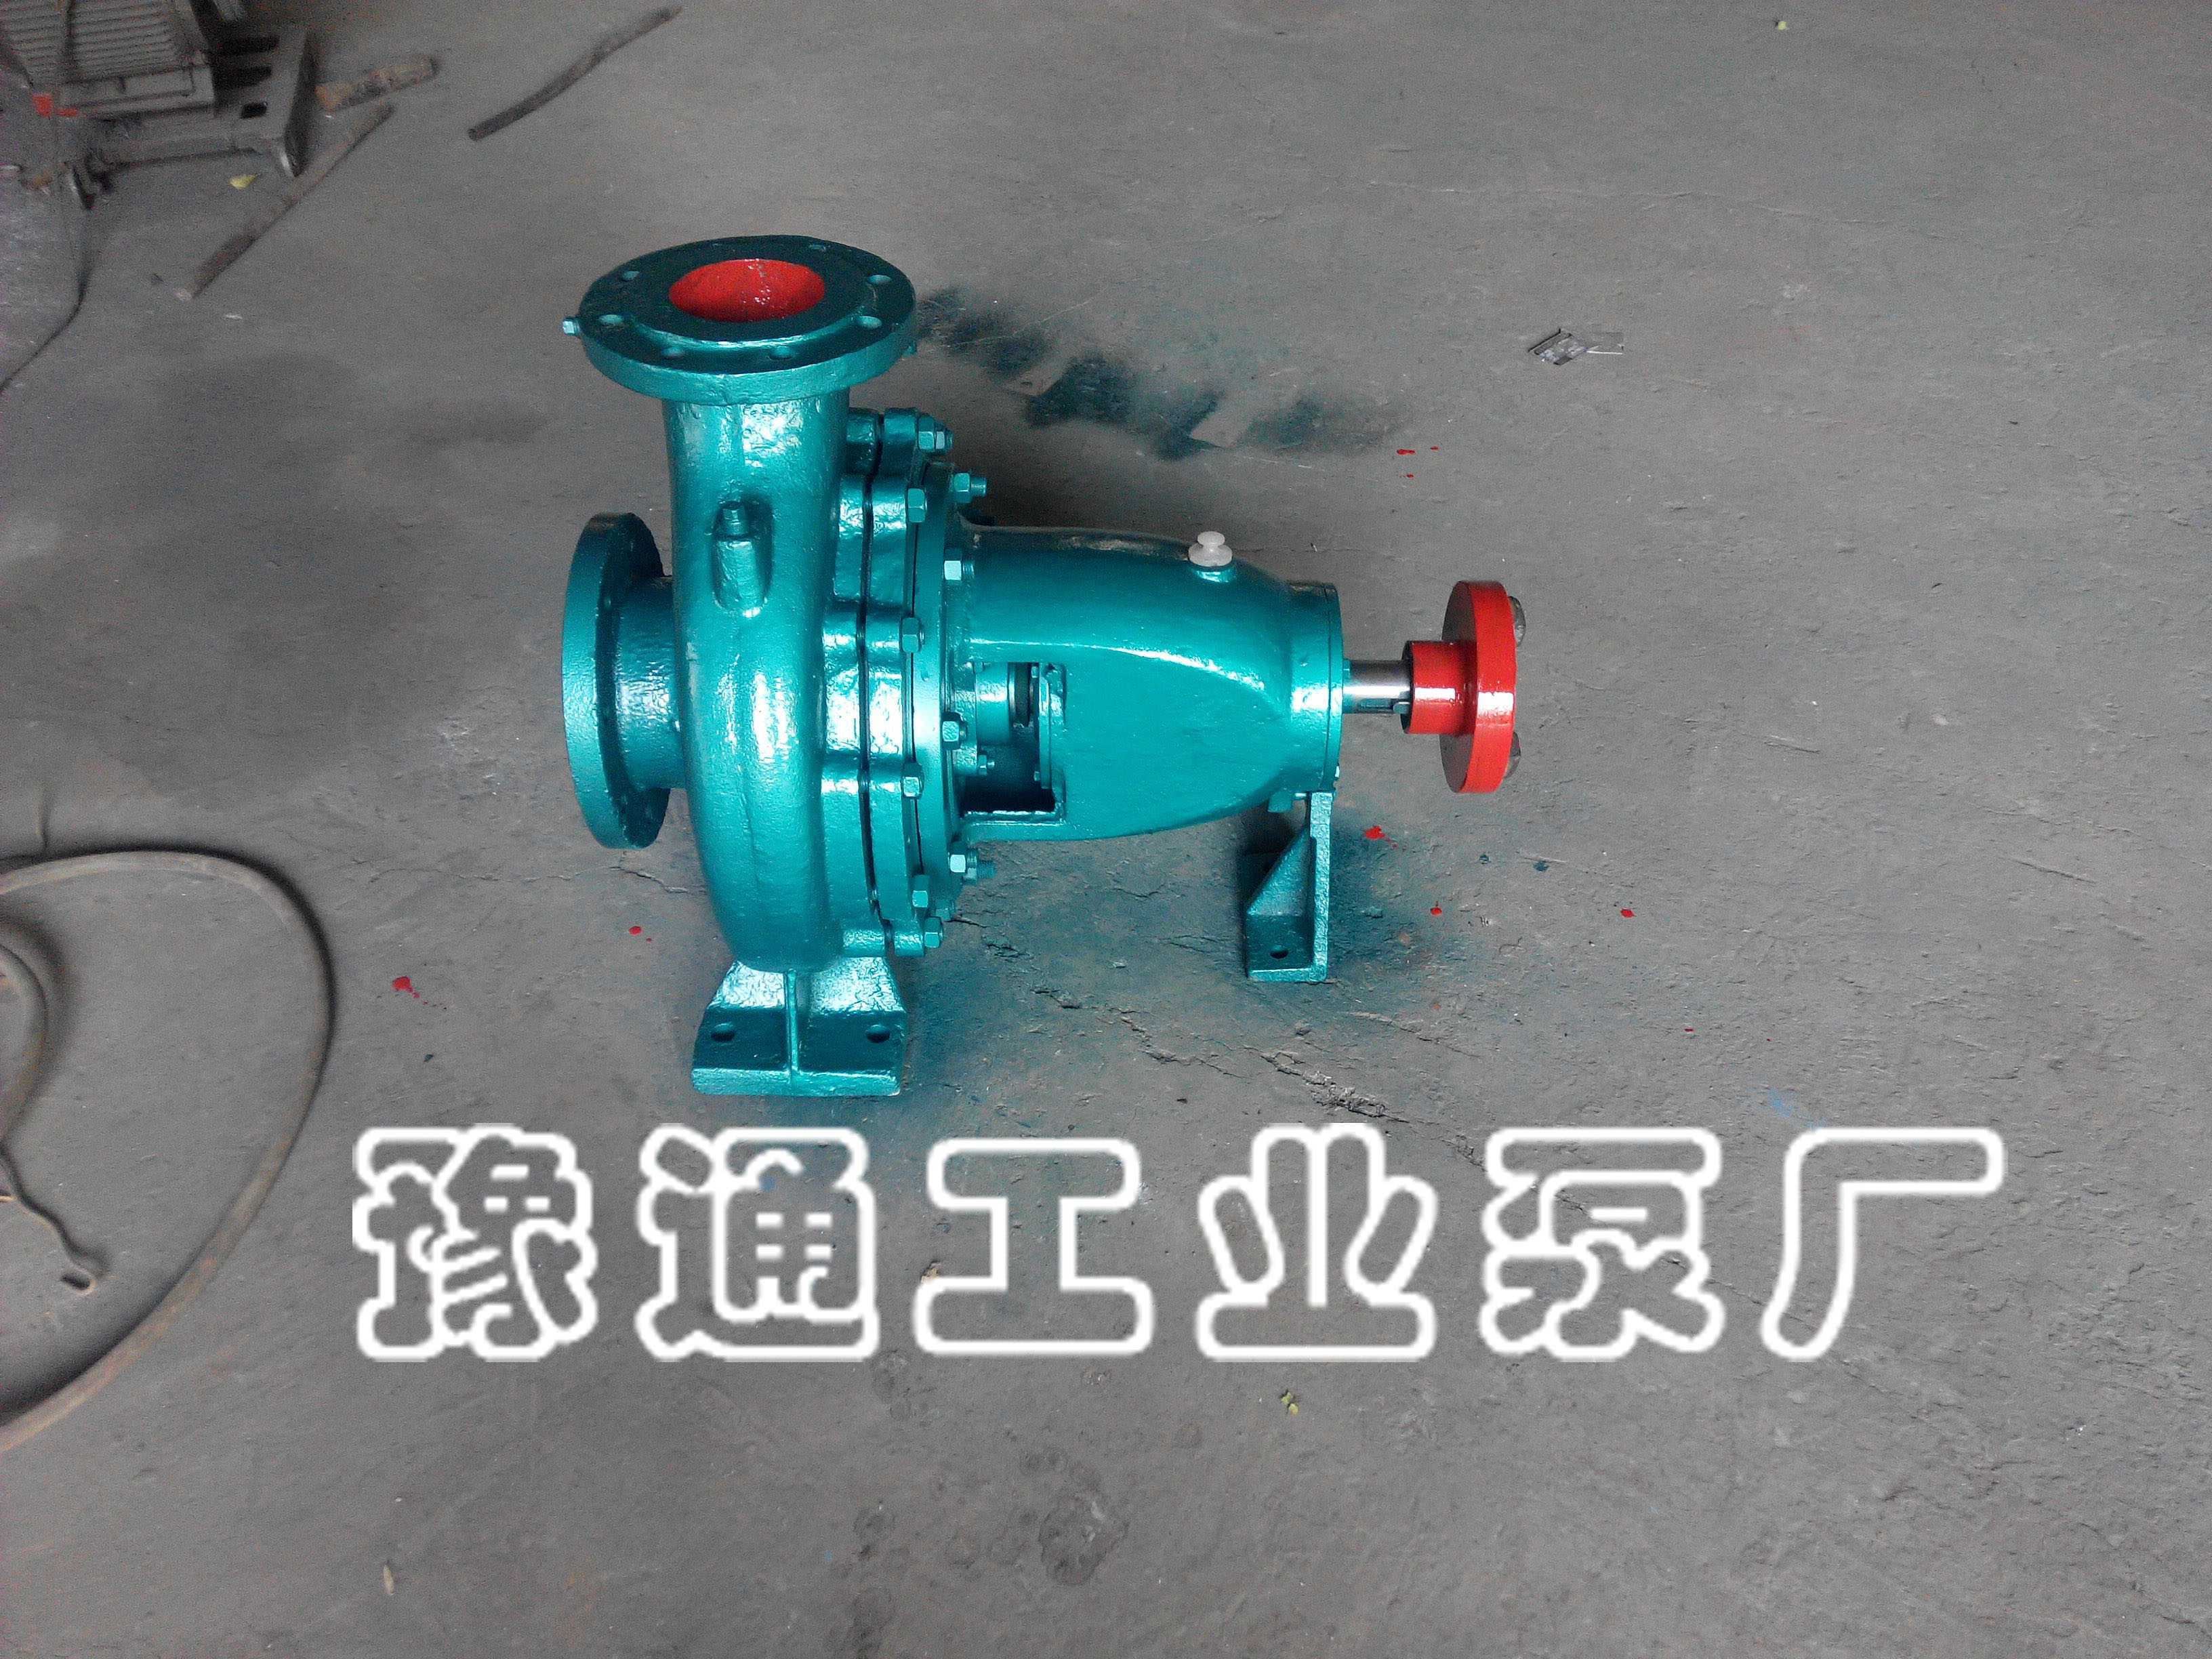 is100-65-200水泵中100、65、200给事表达什么意思?